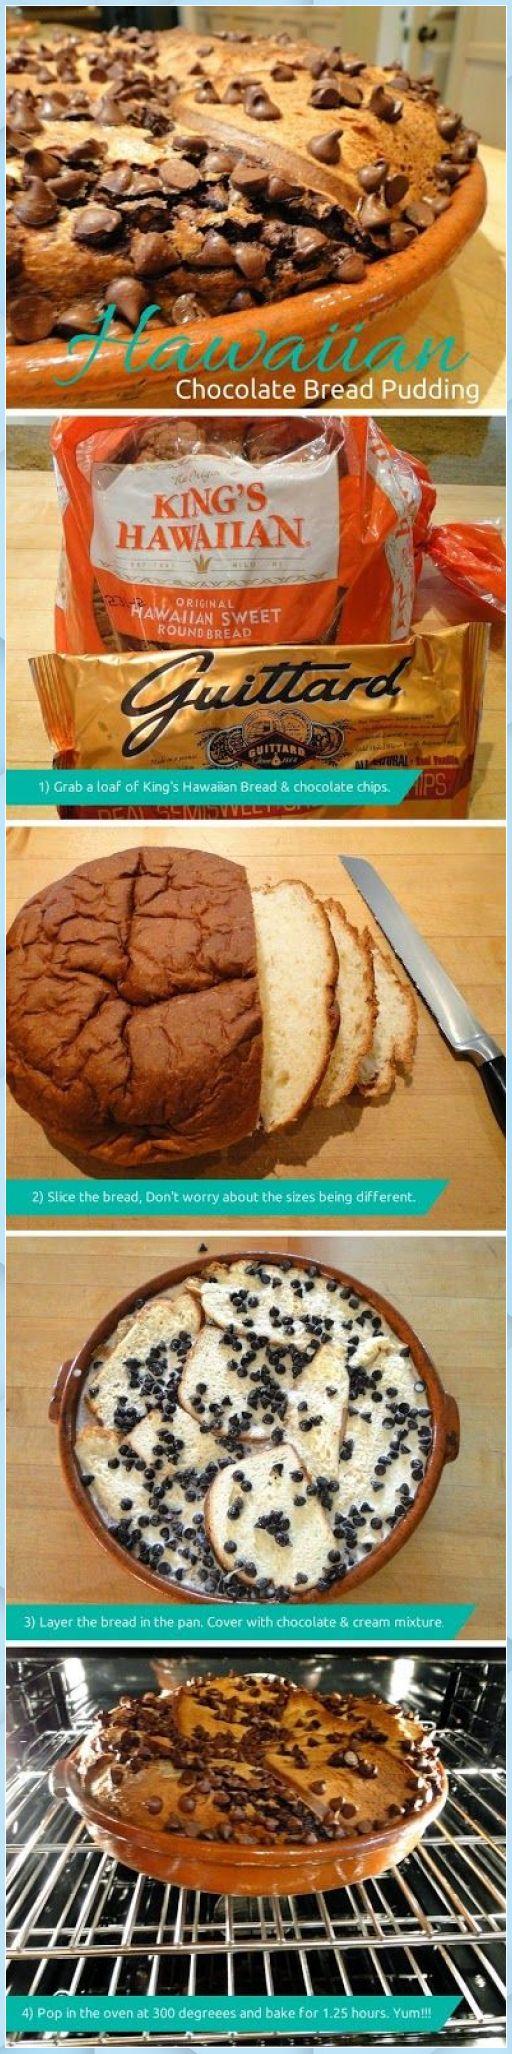 Mar 23, 2020 – Hawaiian chocolate bread pudding | I'm a big bread pudd – Chocolate Bread Pudding #best chocolate bread p…